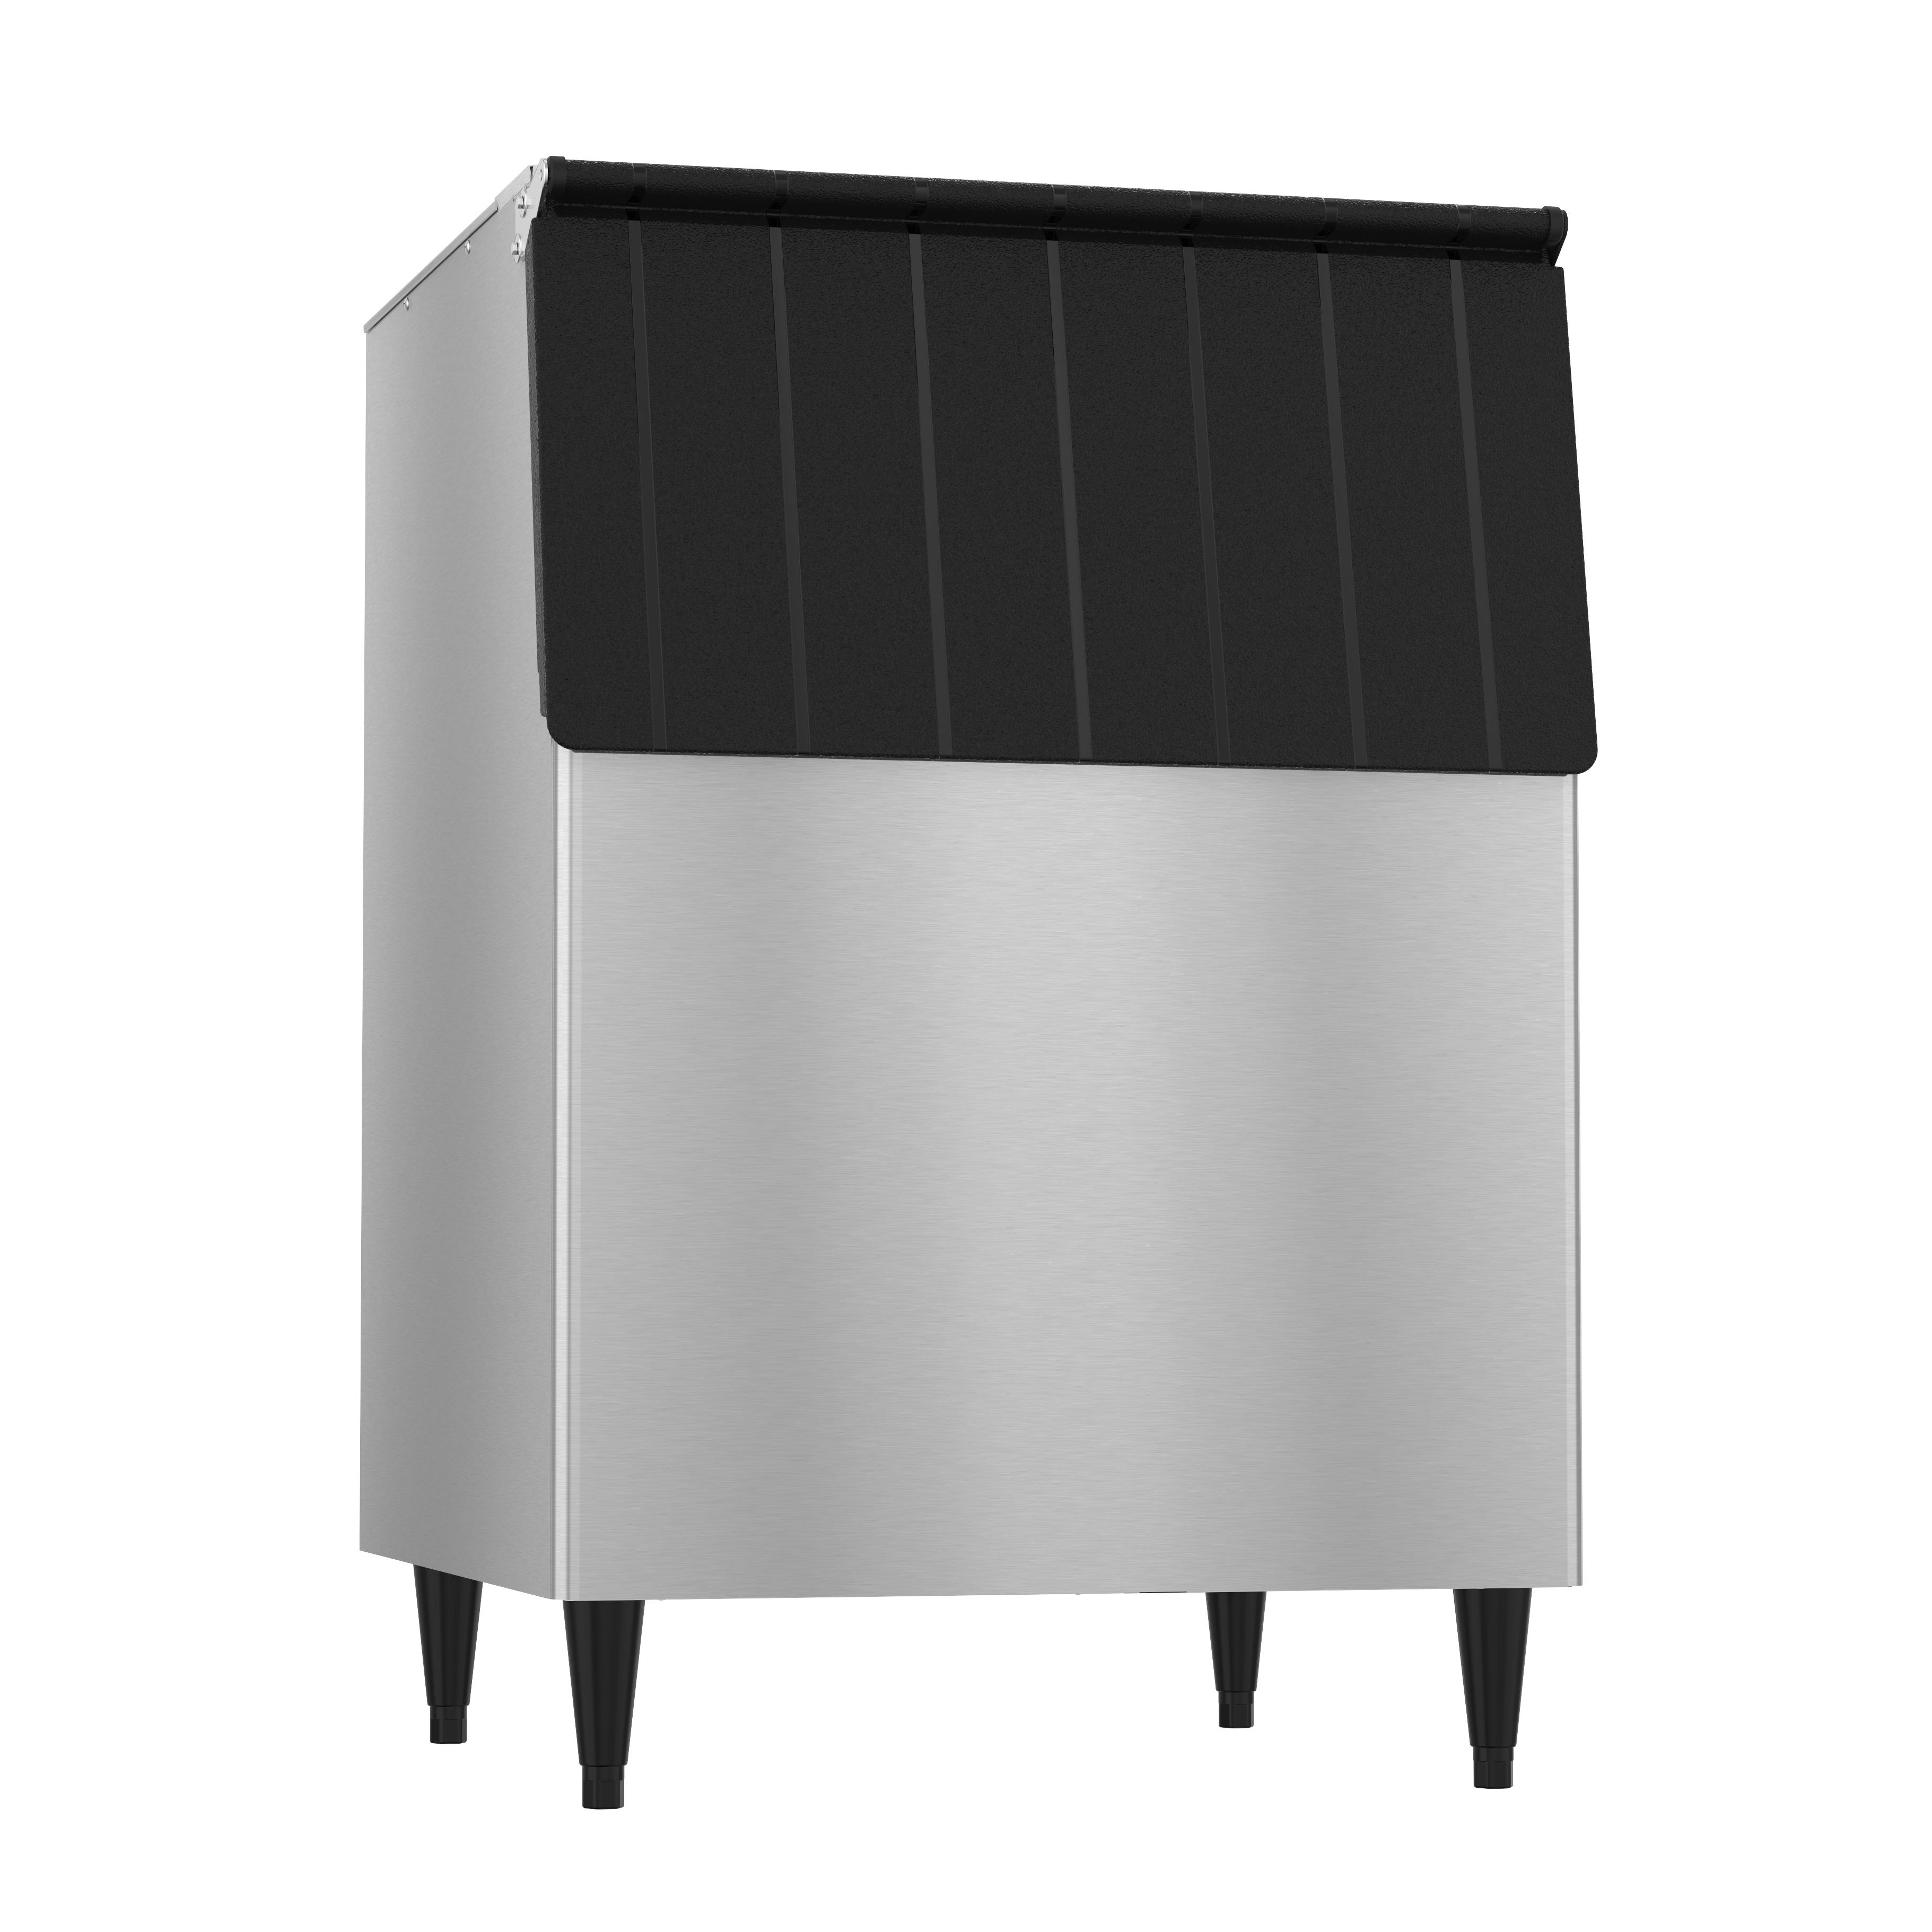 Hoshizaki B-500SF ice cubers, ice storage & ice dispensers